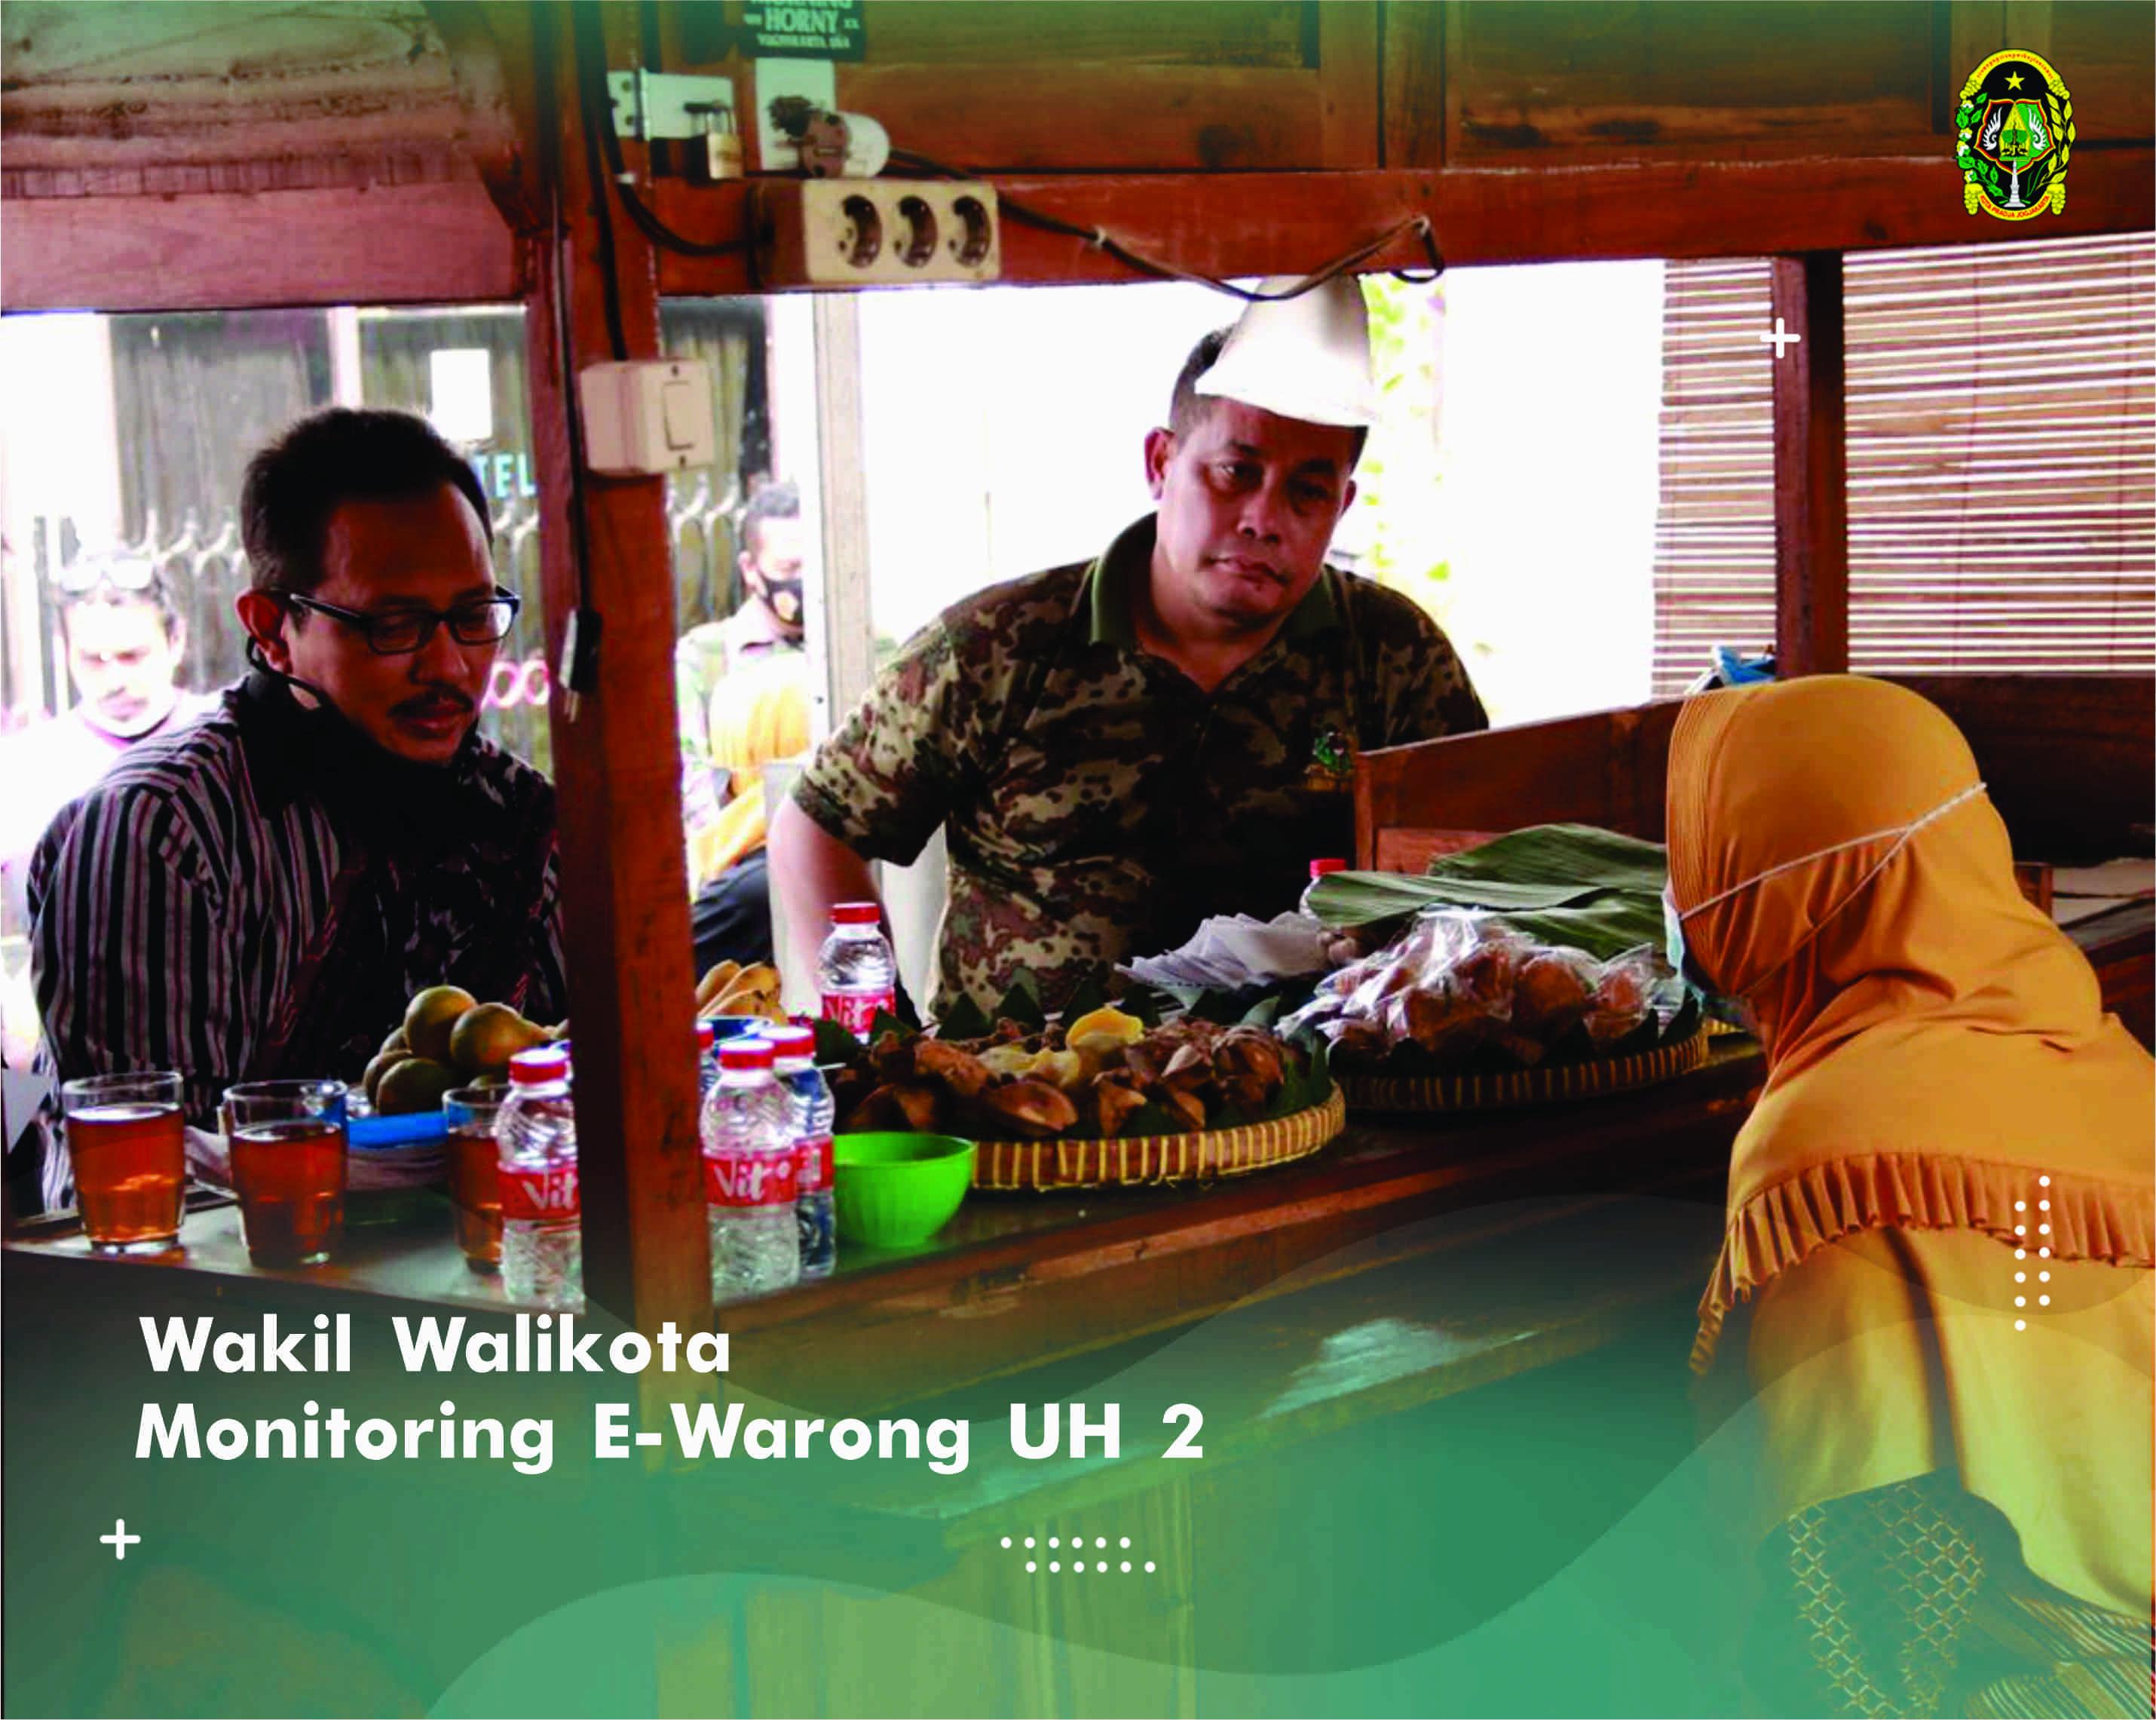 Wakil Walikota Monitoring  E-Warong UH 2